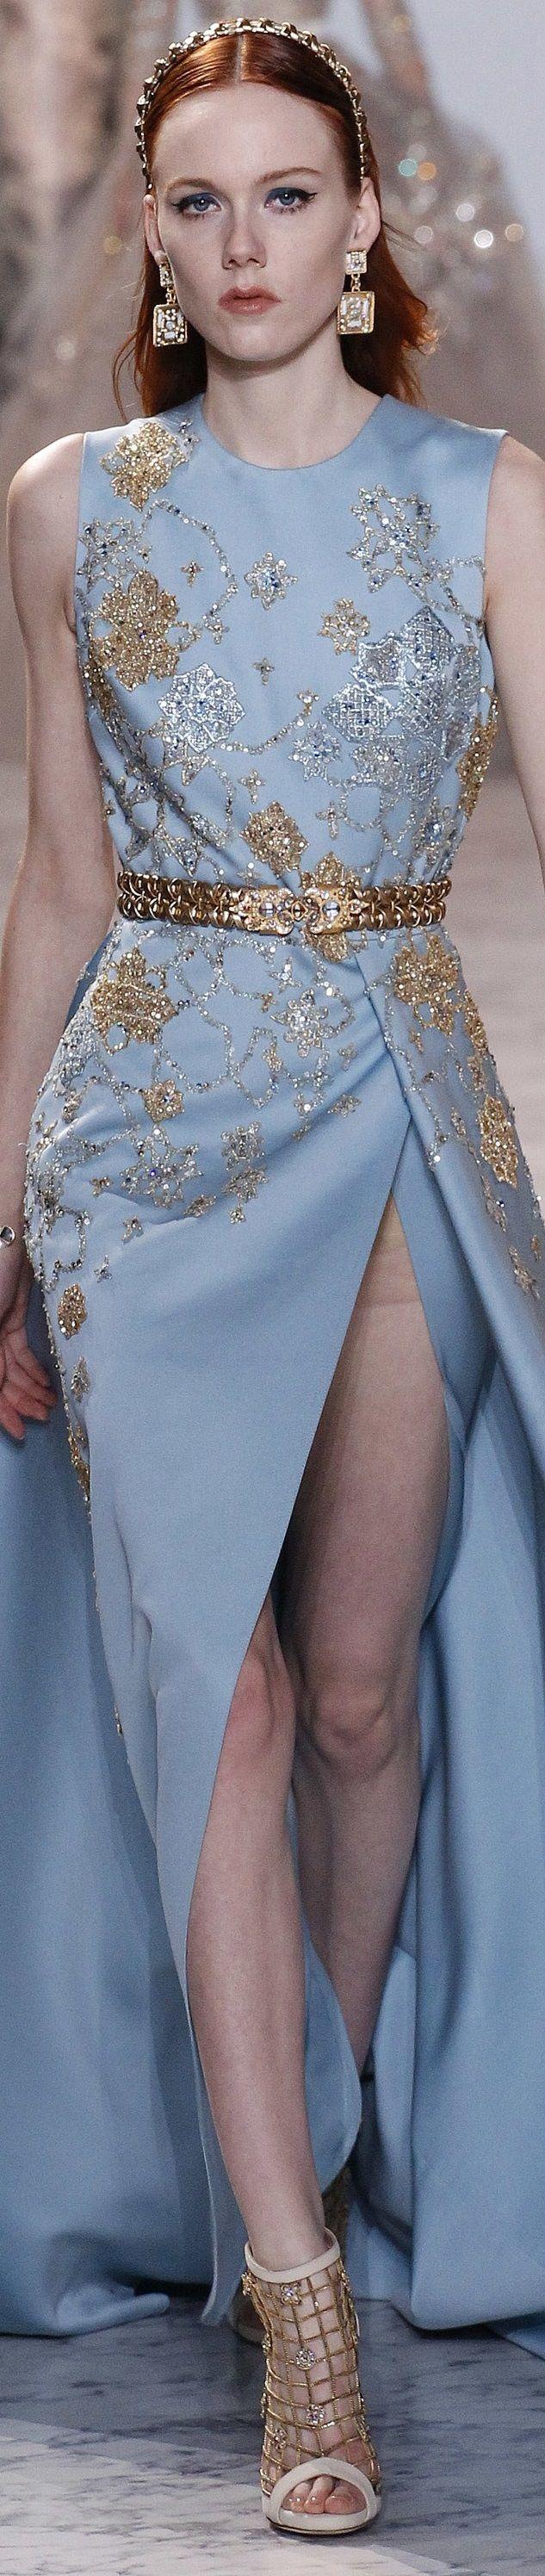 278 best elie saab images on Pinterest   High fashion, Fashion show ...